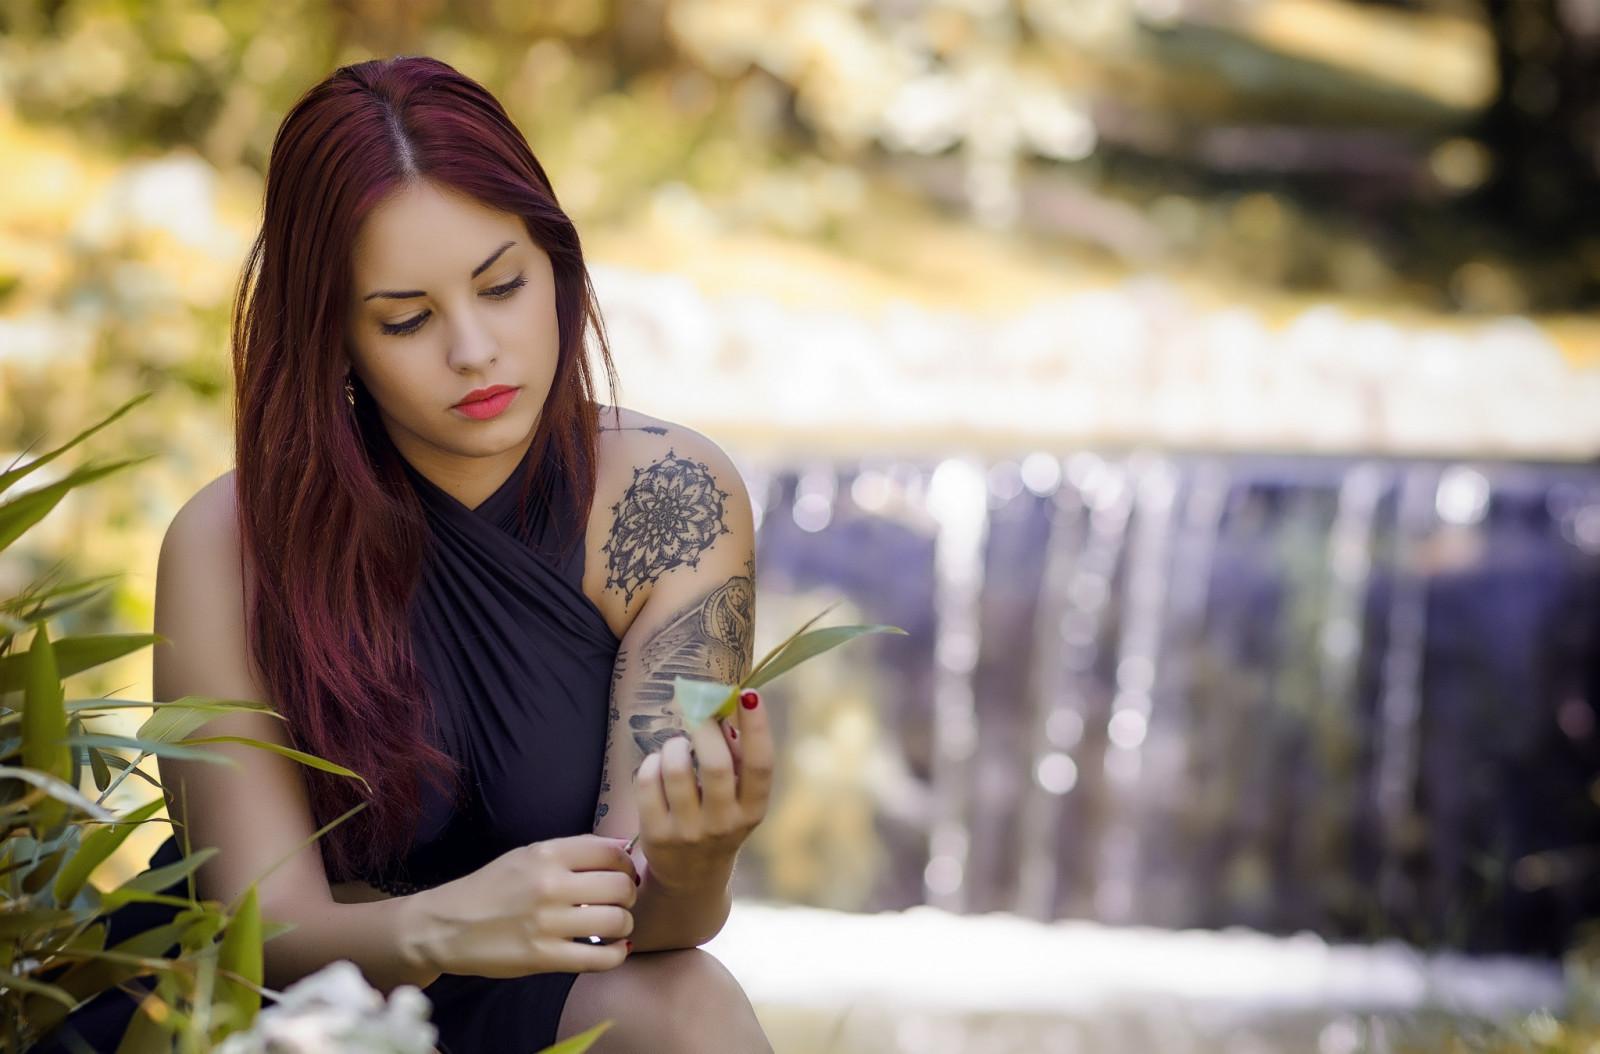 Fondos de pantalla : Amy Thunderbolt, mujer, modelo, pelo